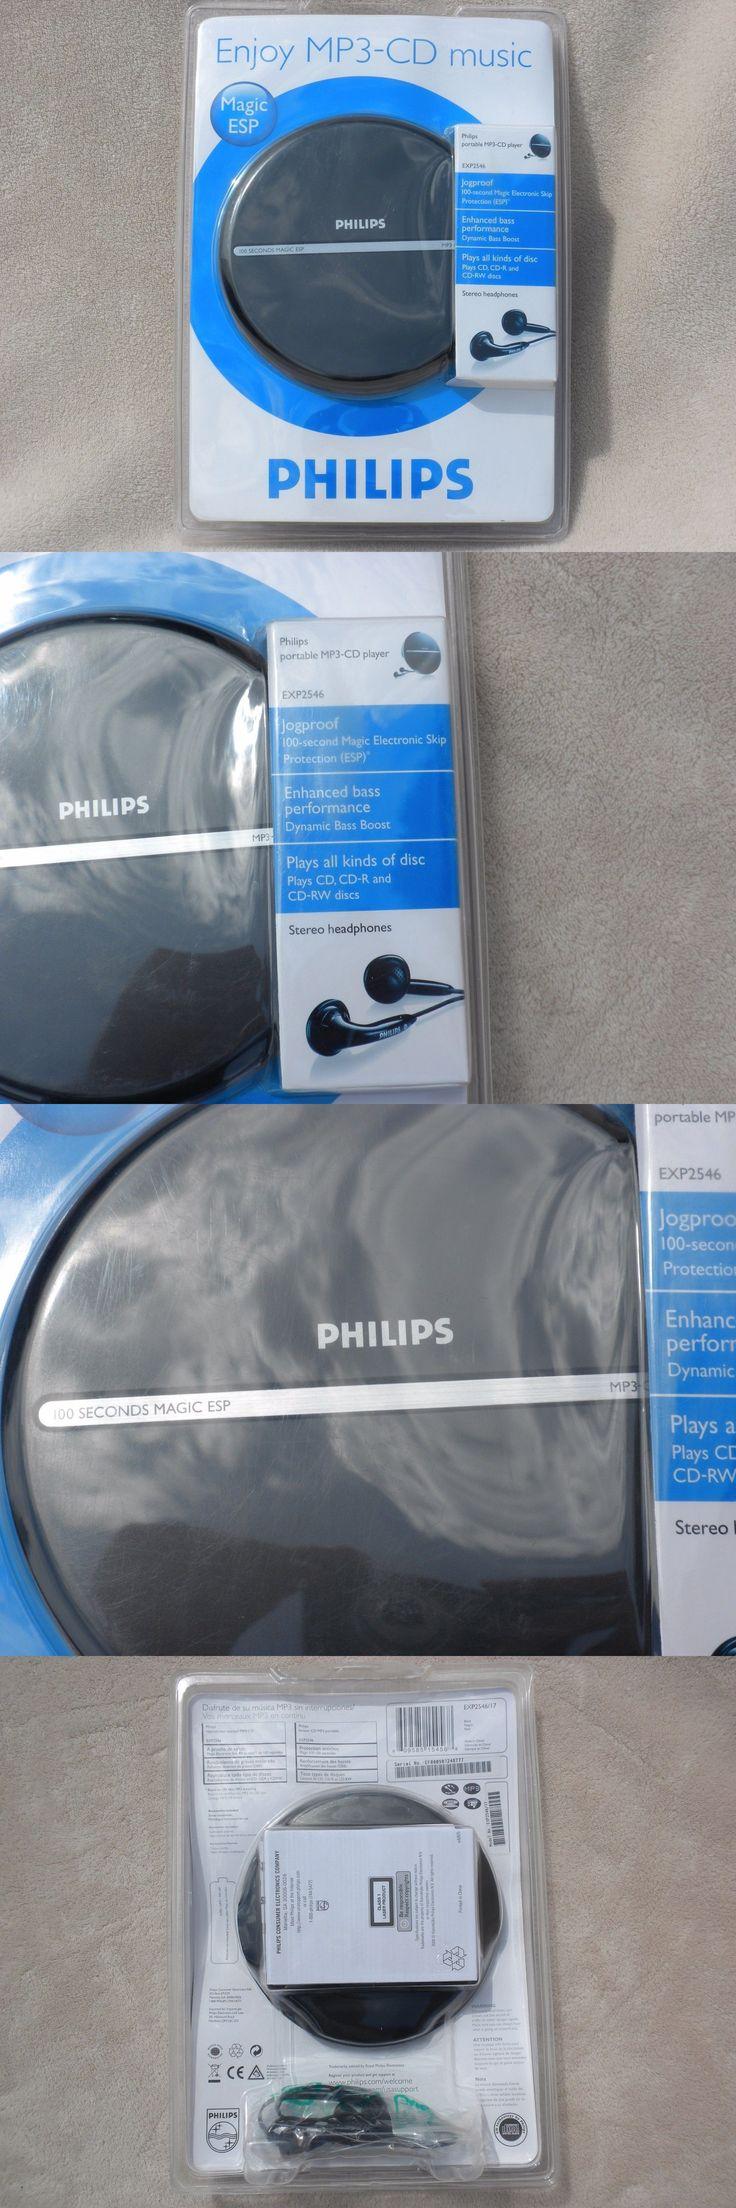 Personal CD Players: Philips 100 Second Magic Esp Jog Proof Cd+R Cd+Rw Discman W Headphone -> BUY IT NOW ONLY: $49.99 on eBay!